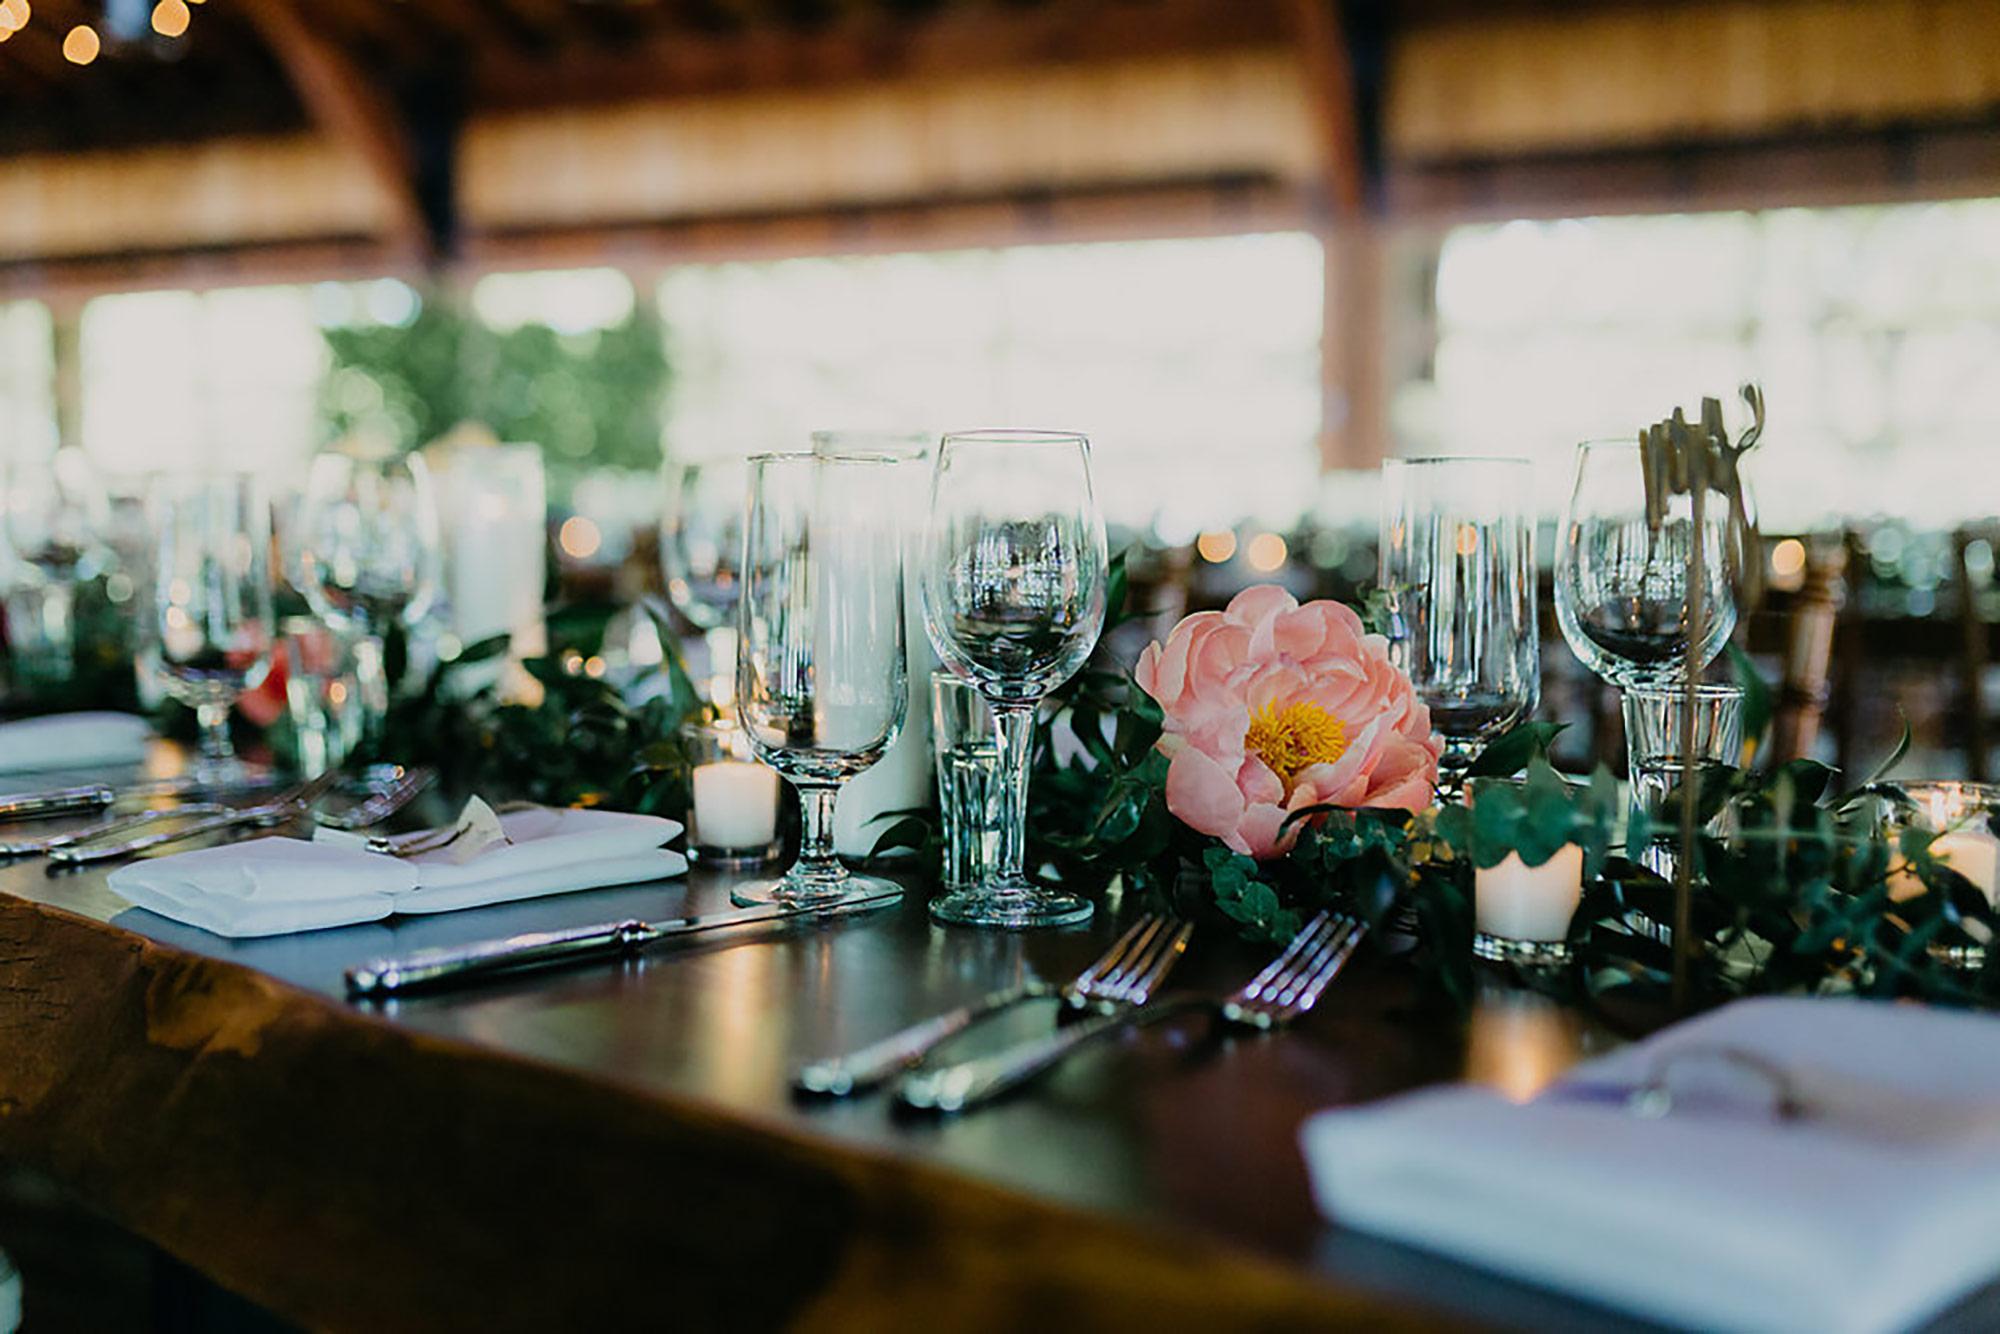 Kurtz-Orchards-Wedding-Niagara-wedding-Vineyard-Bride-Photography-by-Kayla-Rocca-030.JPG